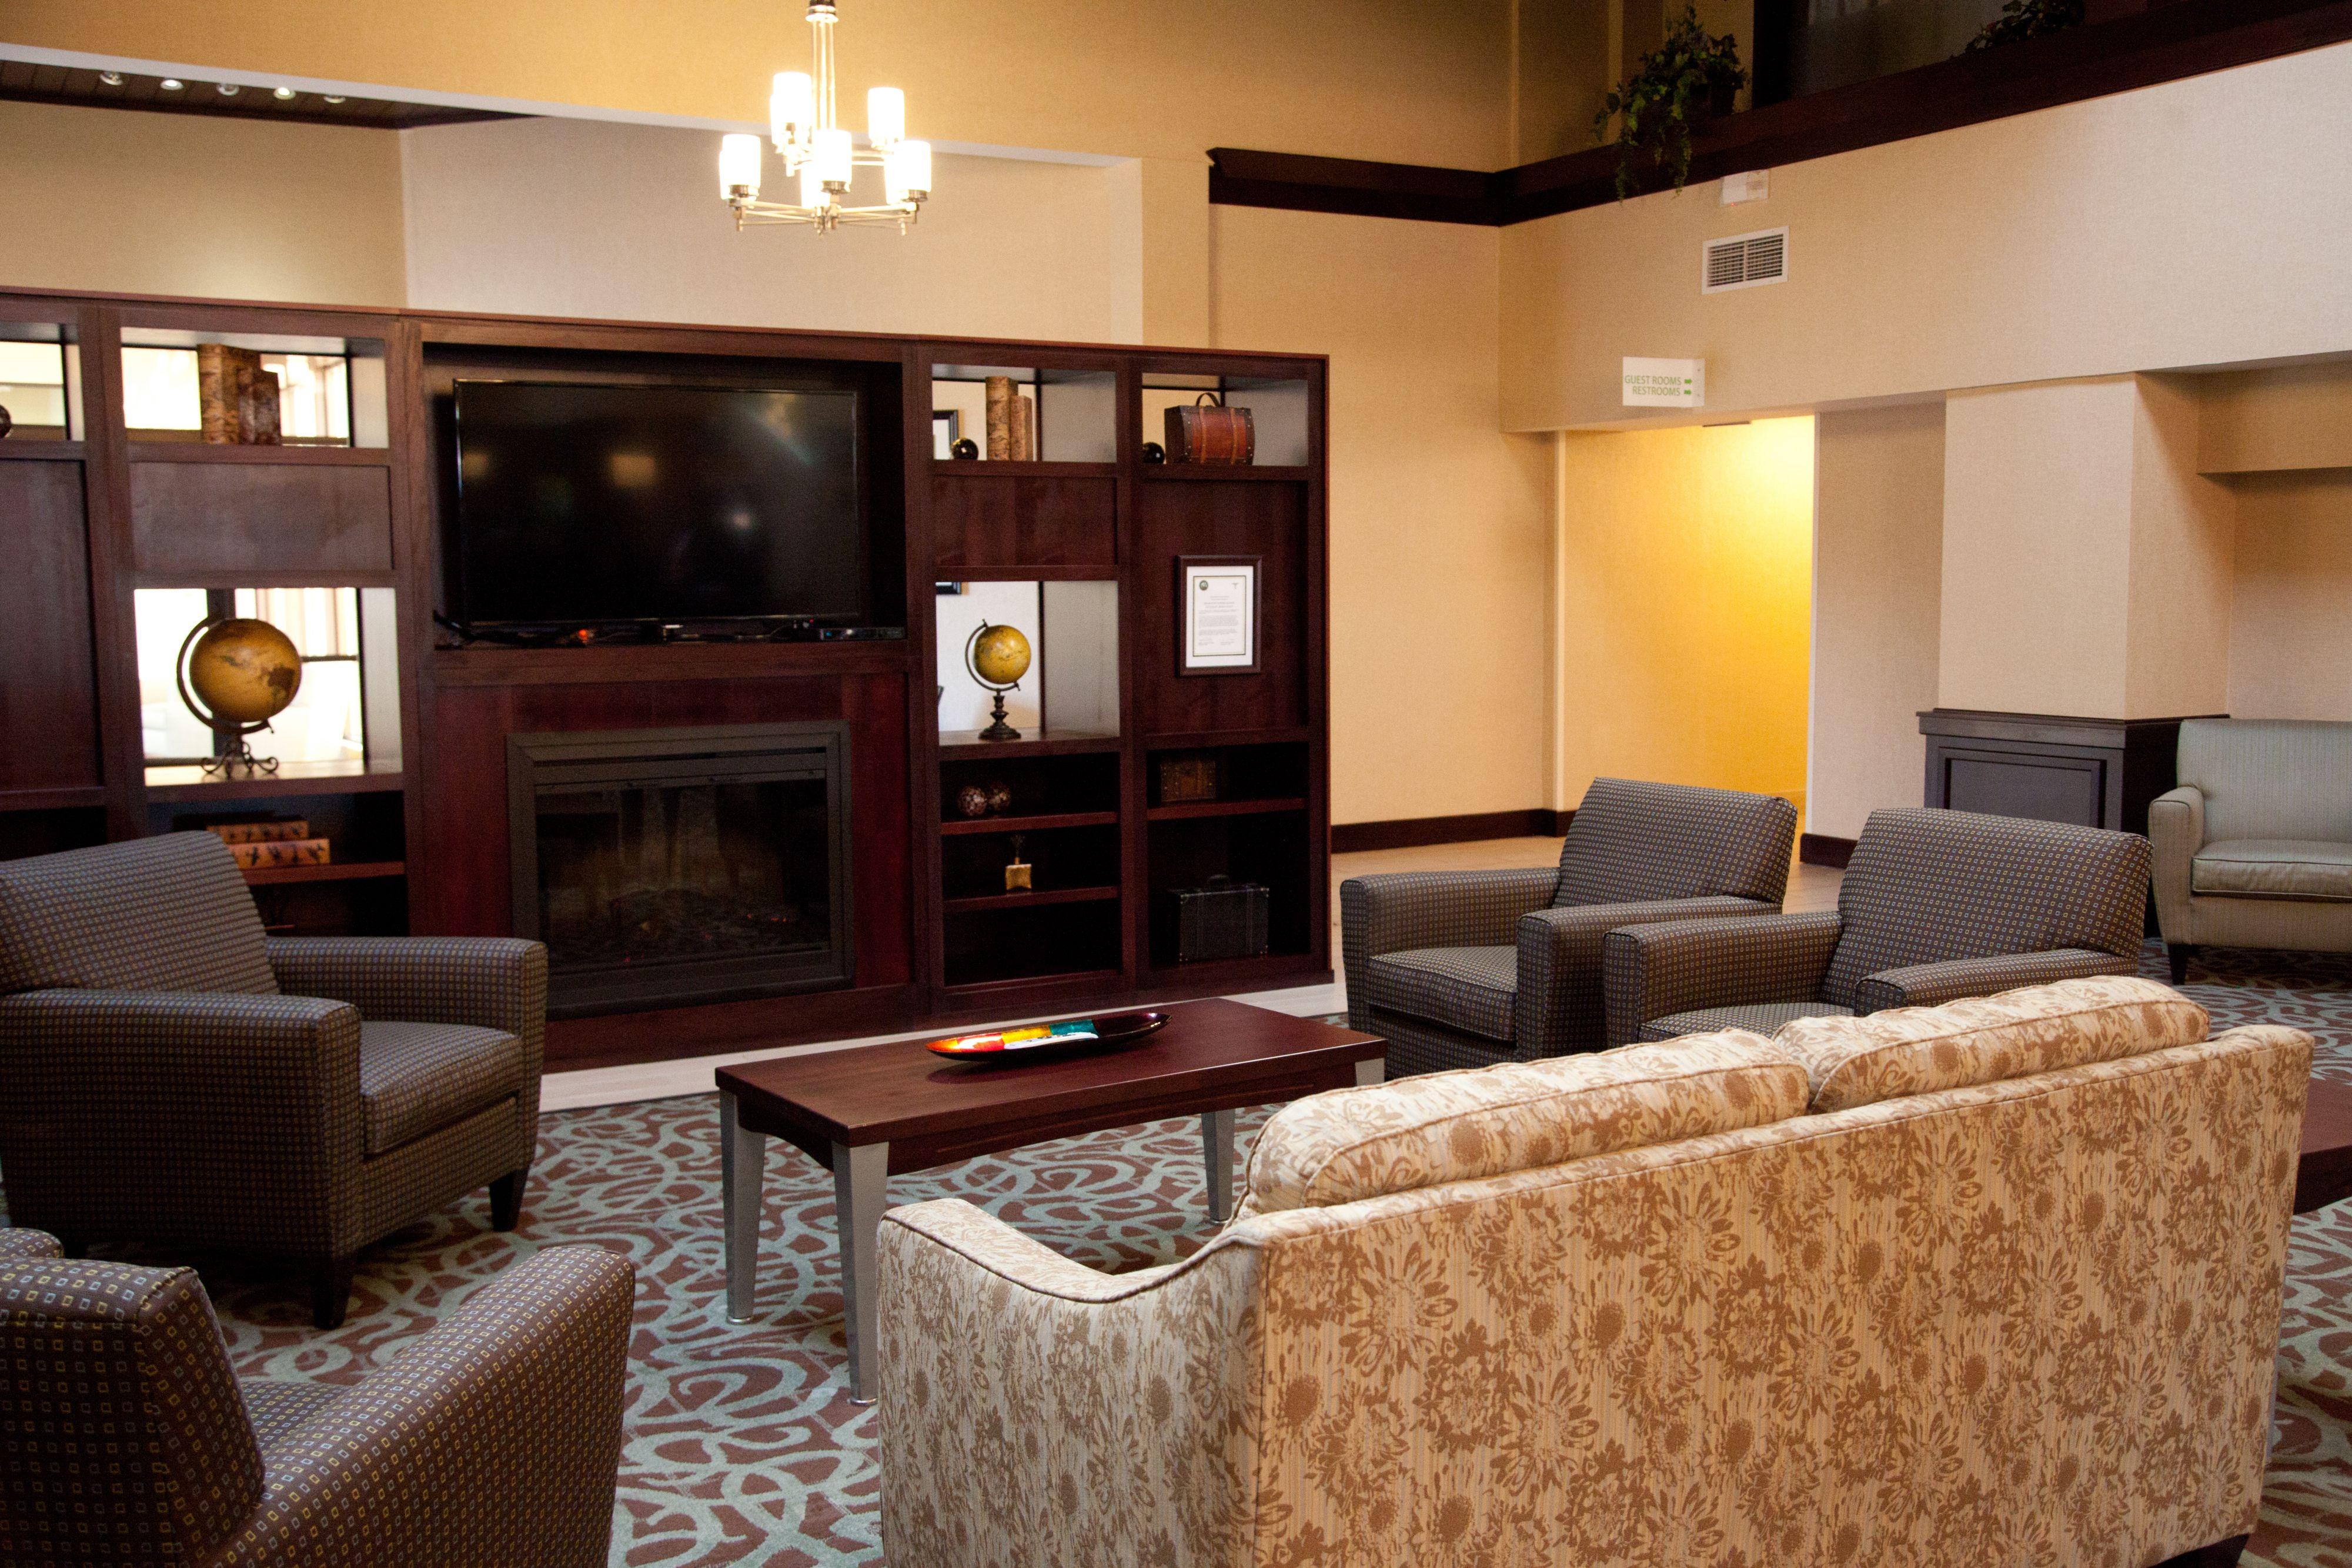 Holiday Inn Gurnee Convention Center image 4